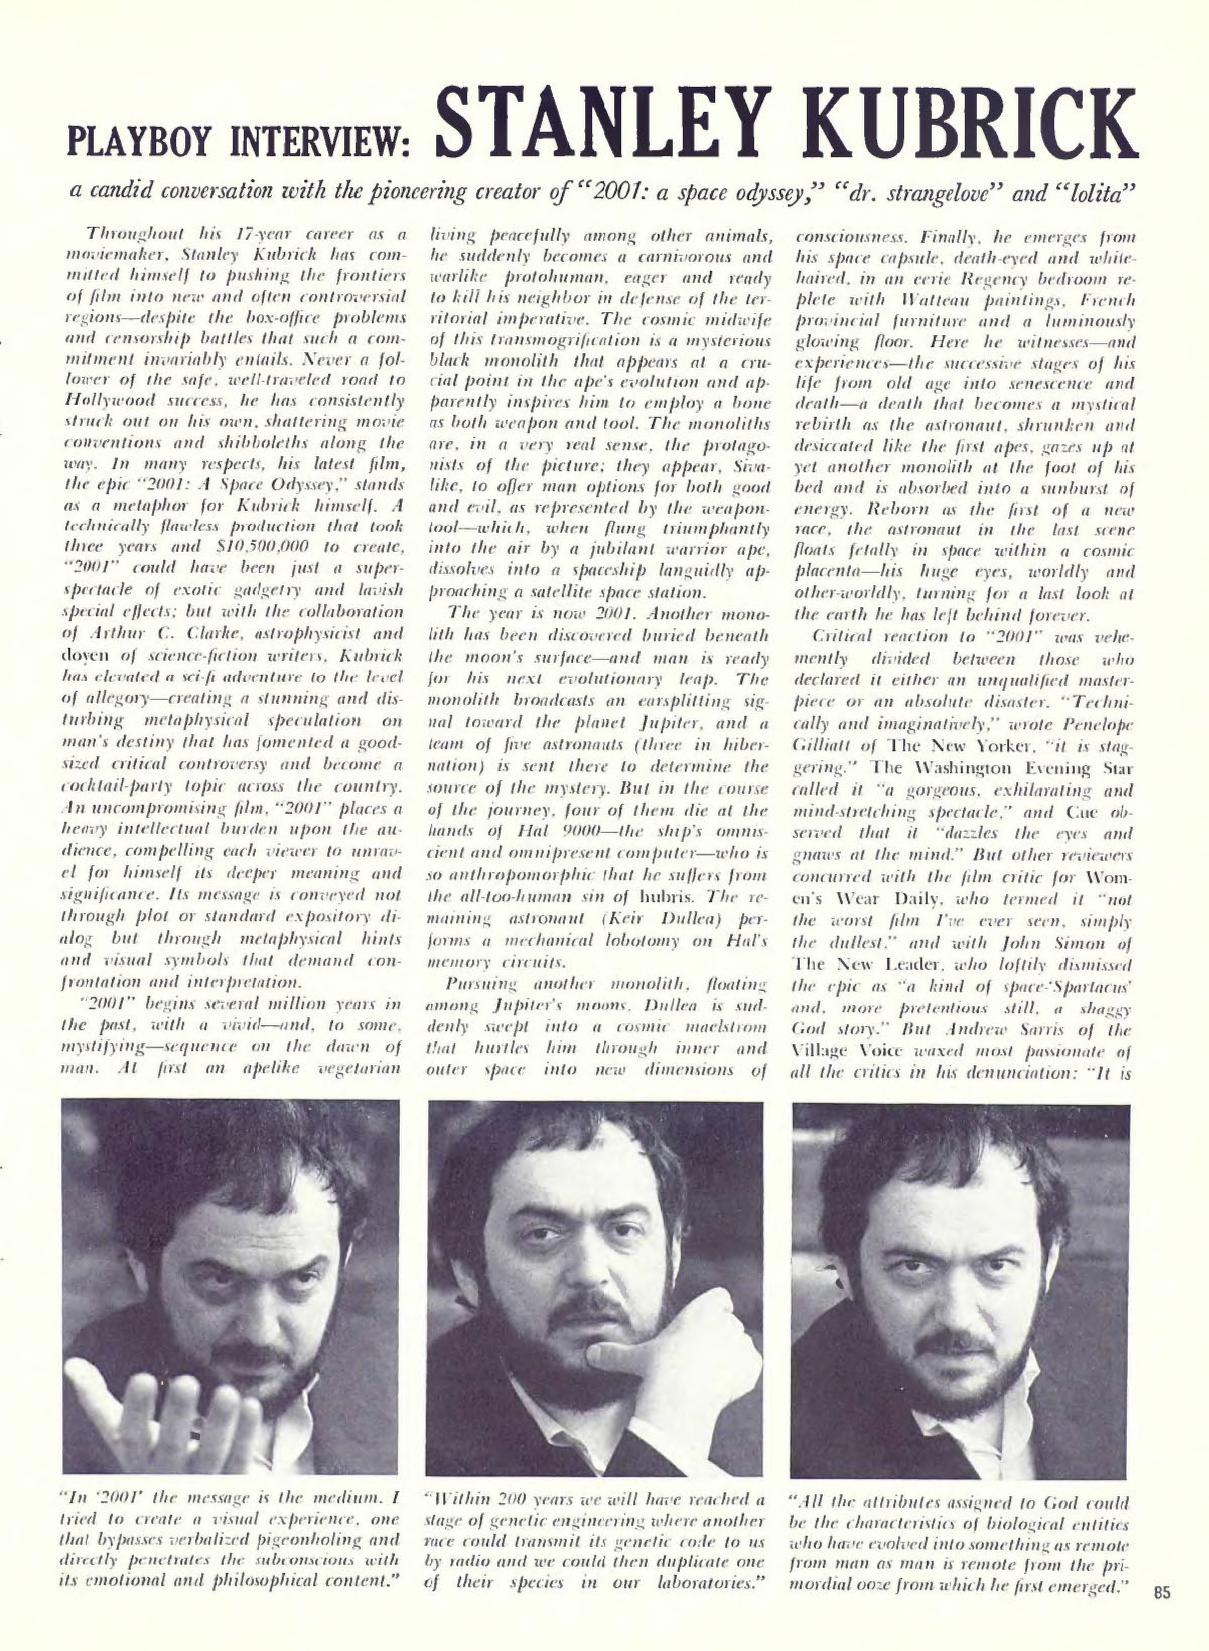 Playboy interview - Stanley Kubrick